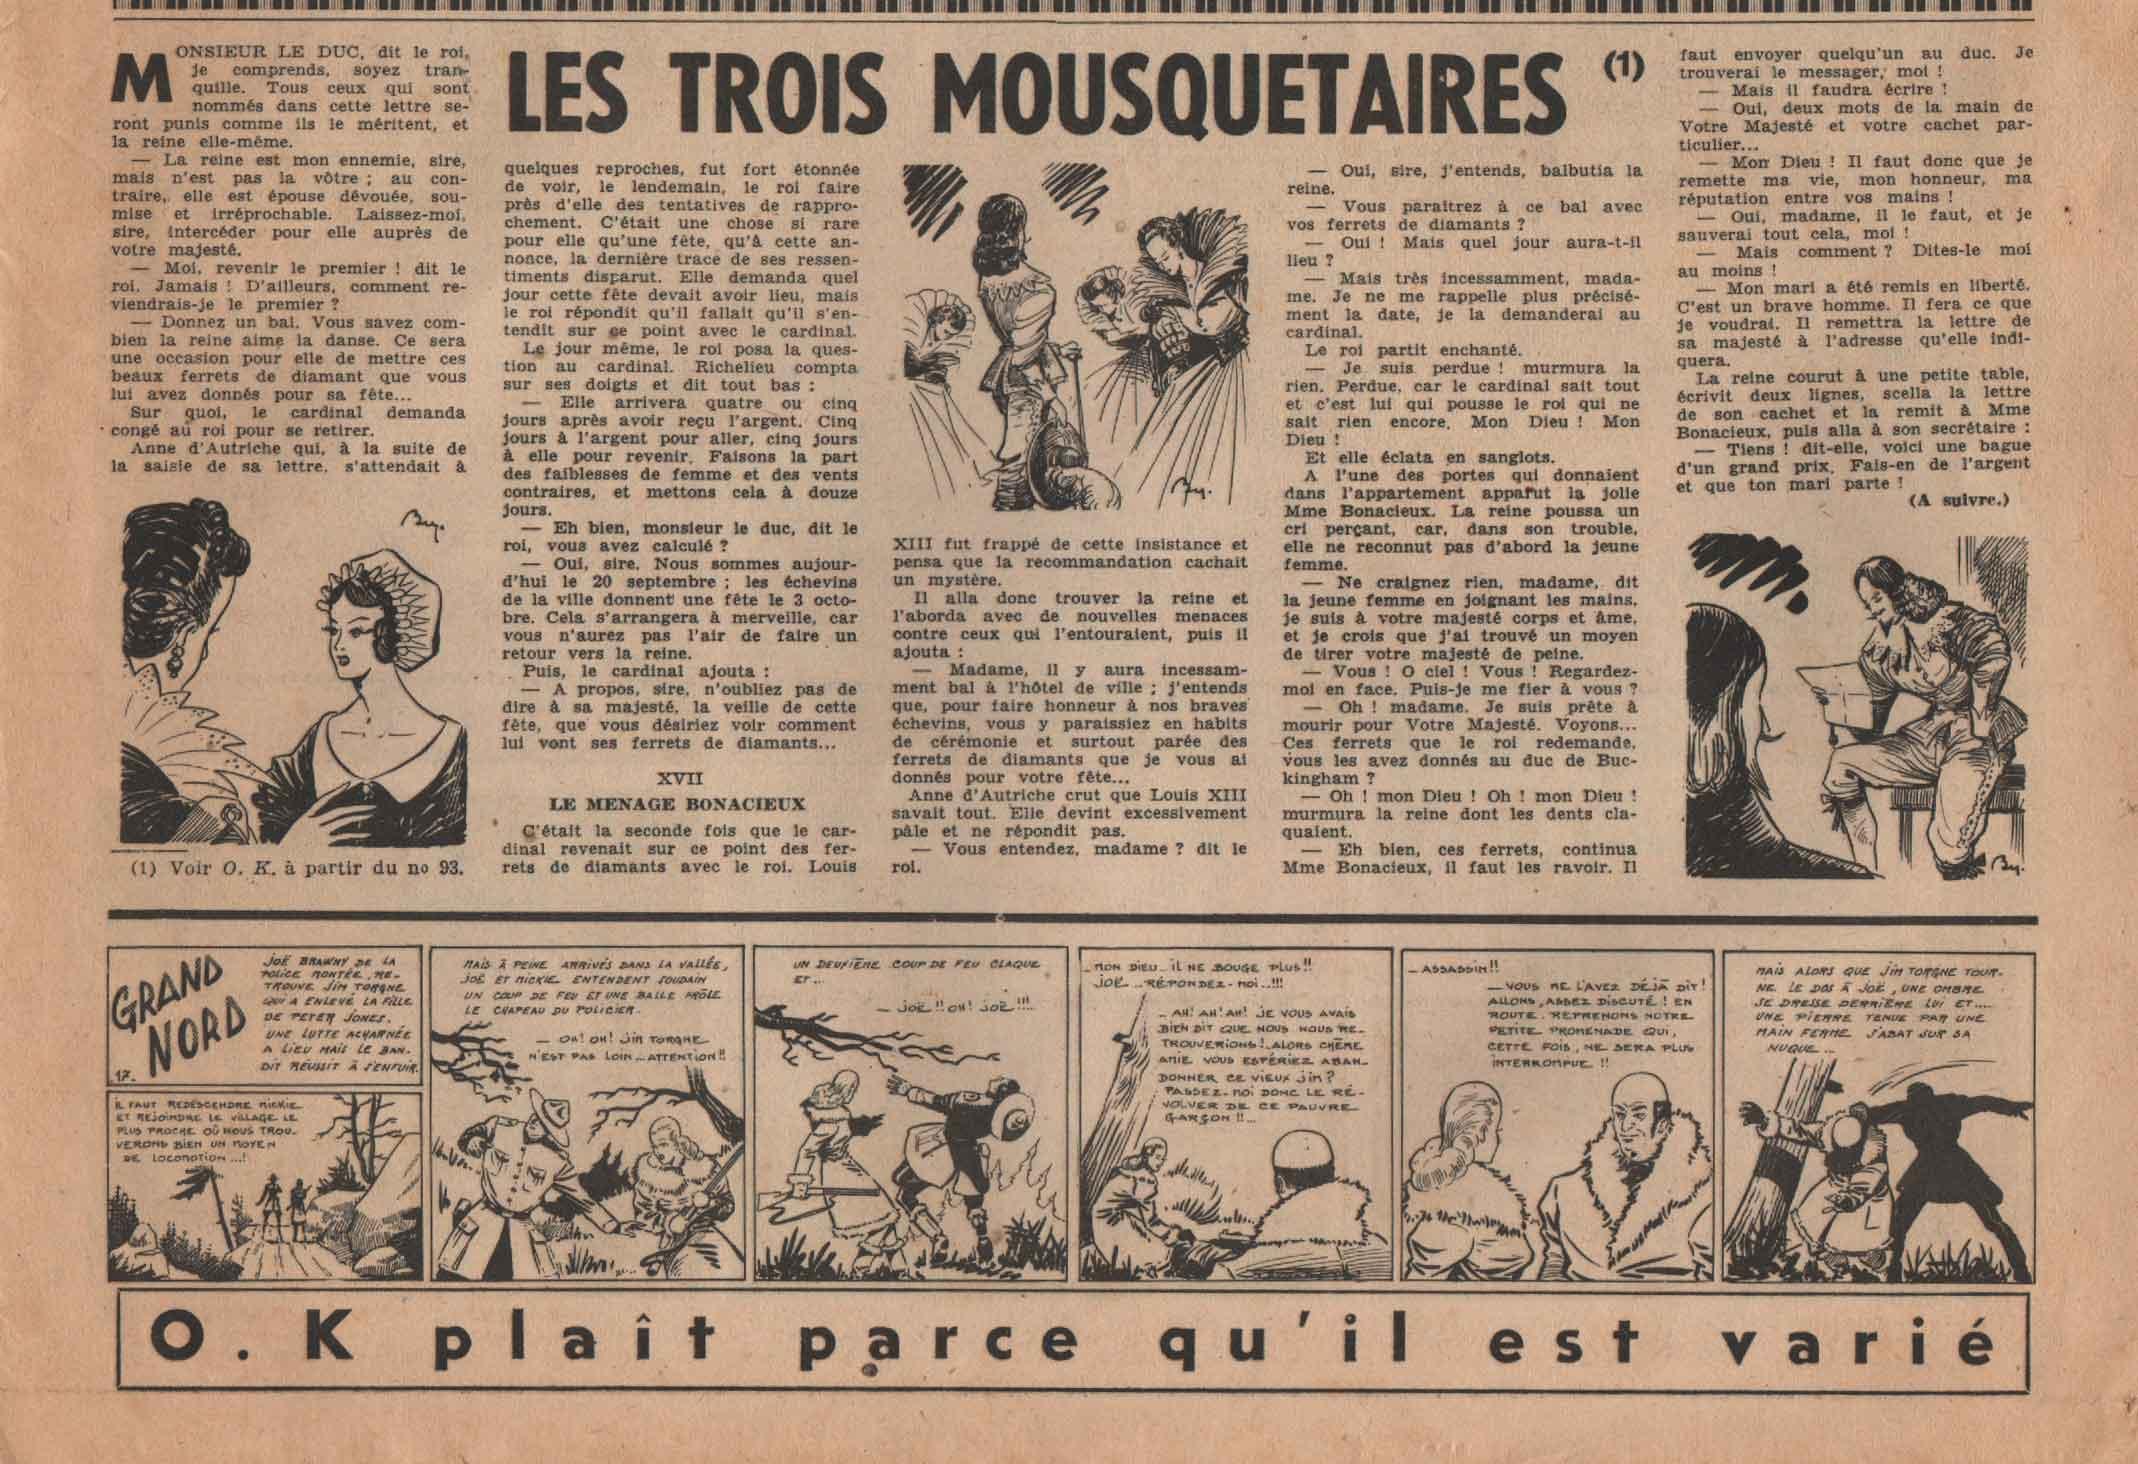 « Grand Nord » et « Les 3 Mousquetaires » O.K n° 139 (03/03/1949).